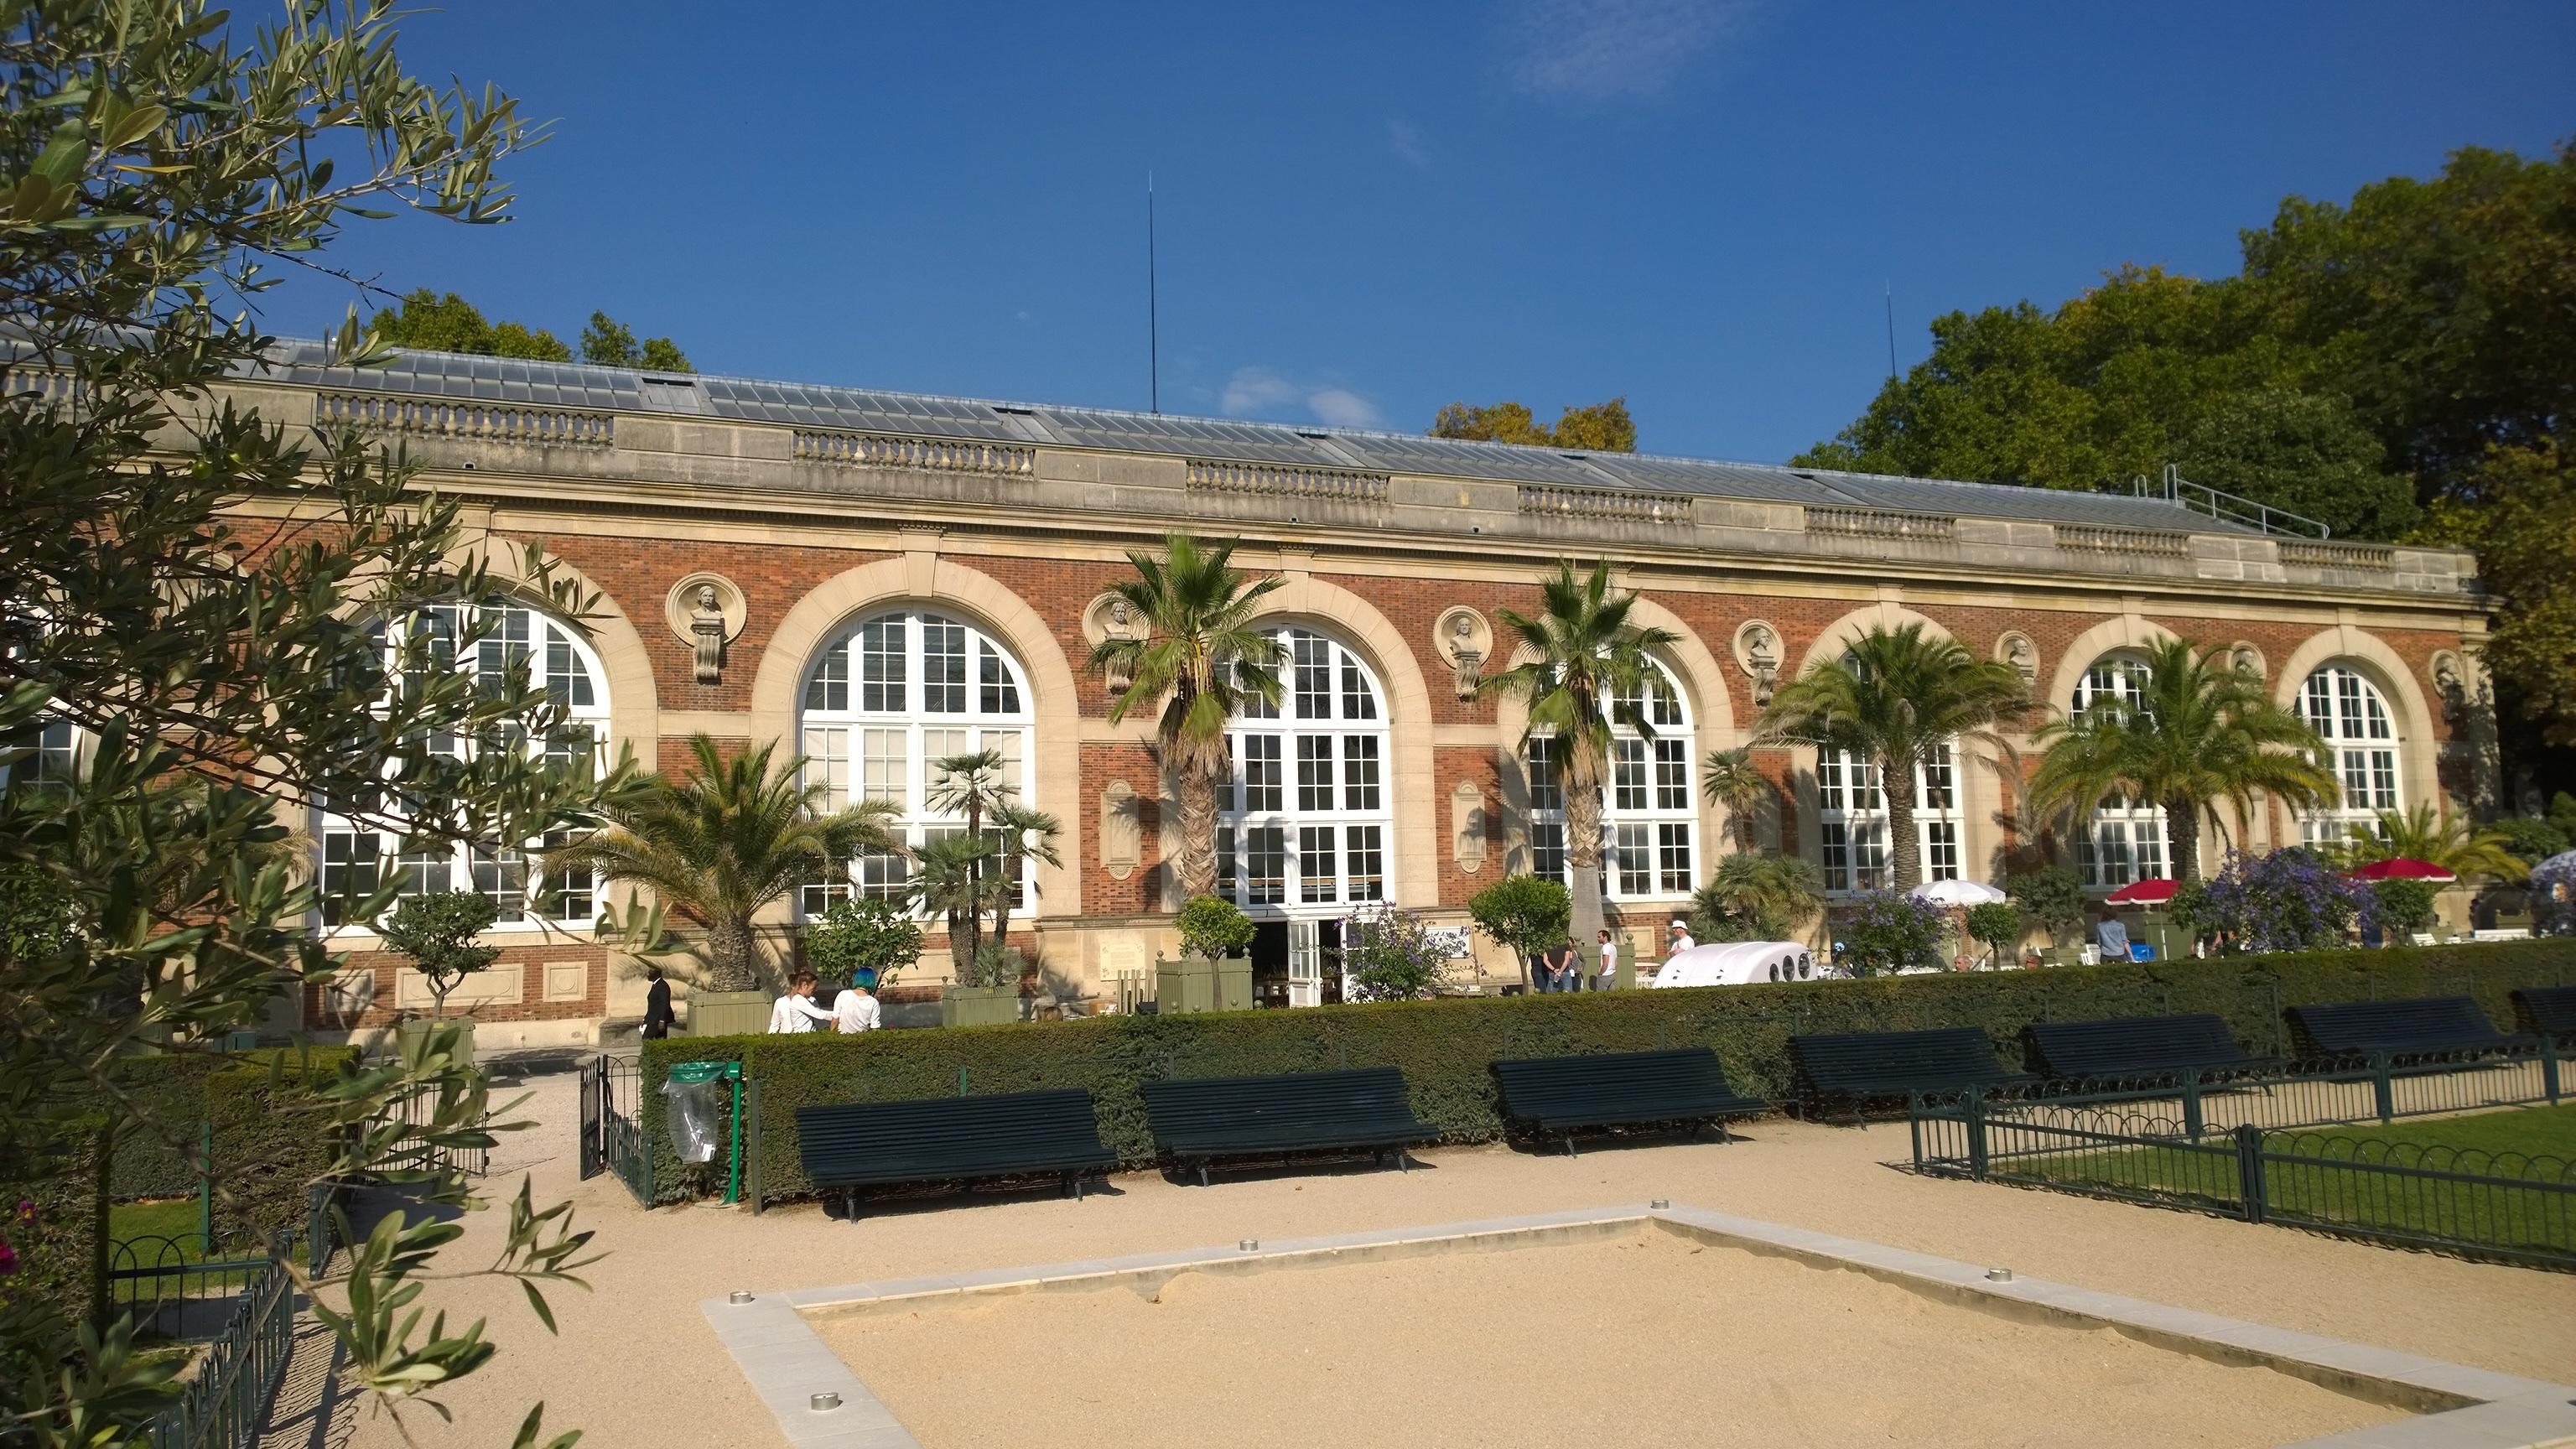 File Orangerie Du Jardin Du Luxembourg Paris France Panoramio 26